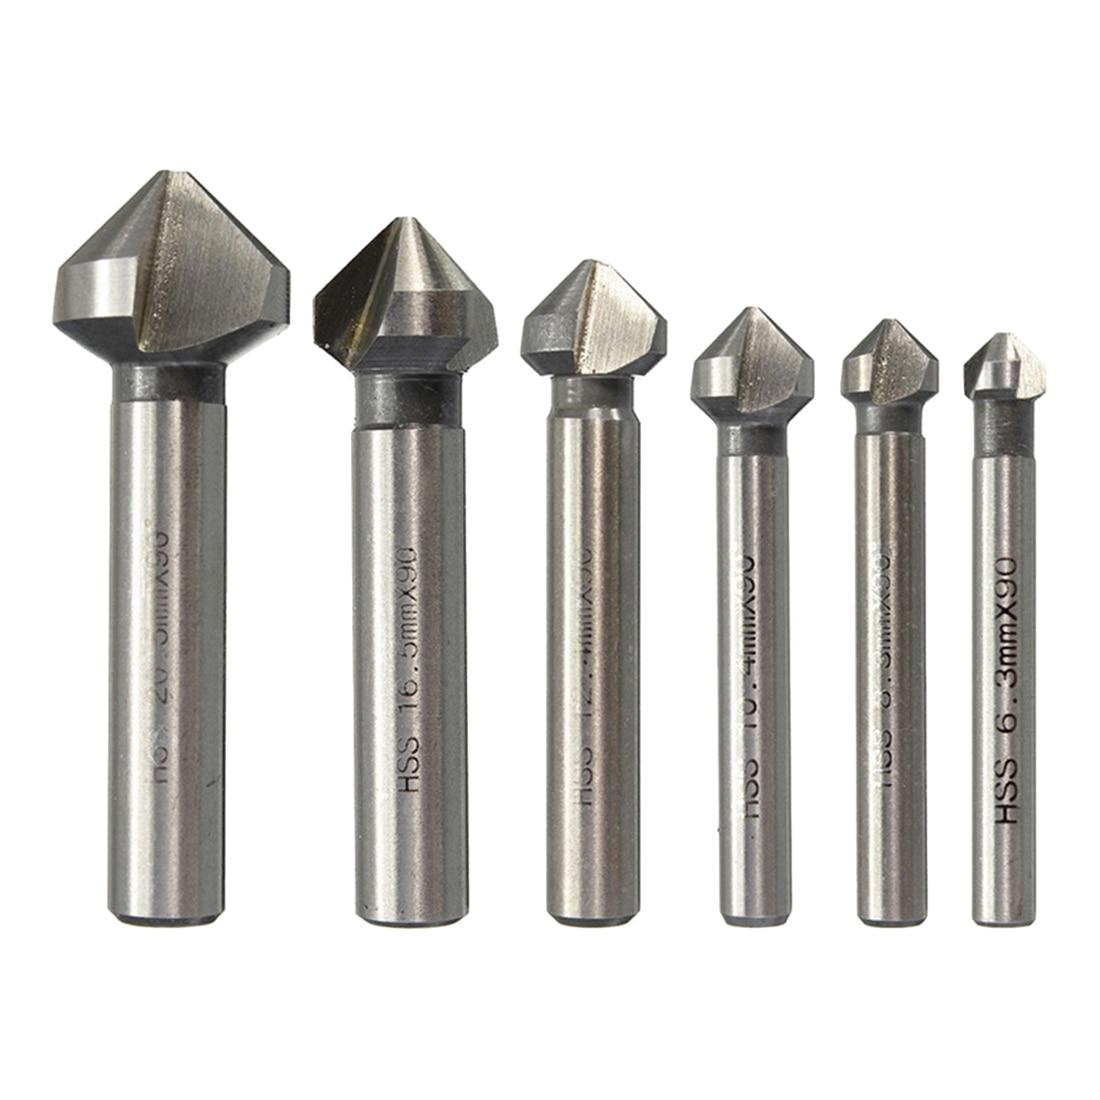 1pc 3 Flute HSS Countersink Drill Bit 90 Degree Chamfer Cutter Tool For Wood Steel 6.3/8.3/10.4/12.4/16.5/20.5mm